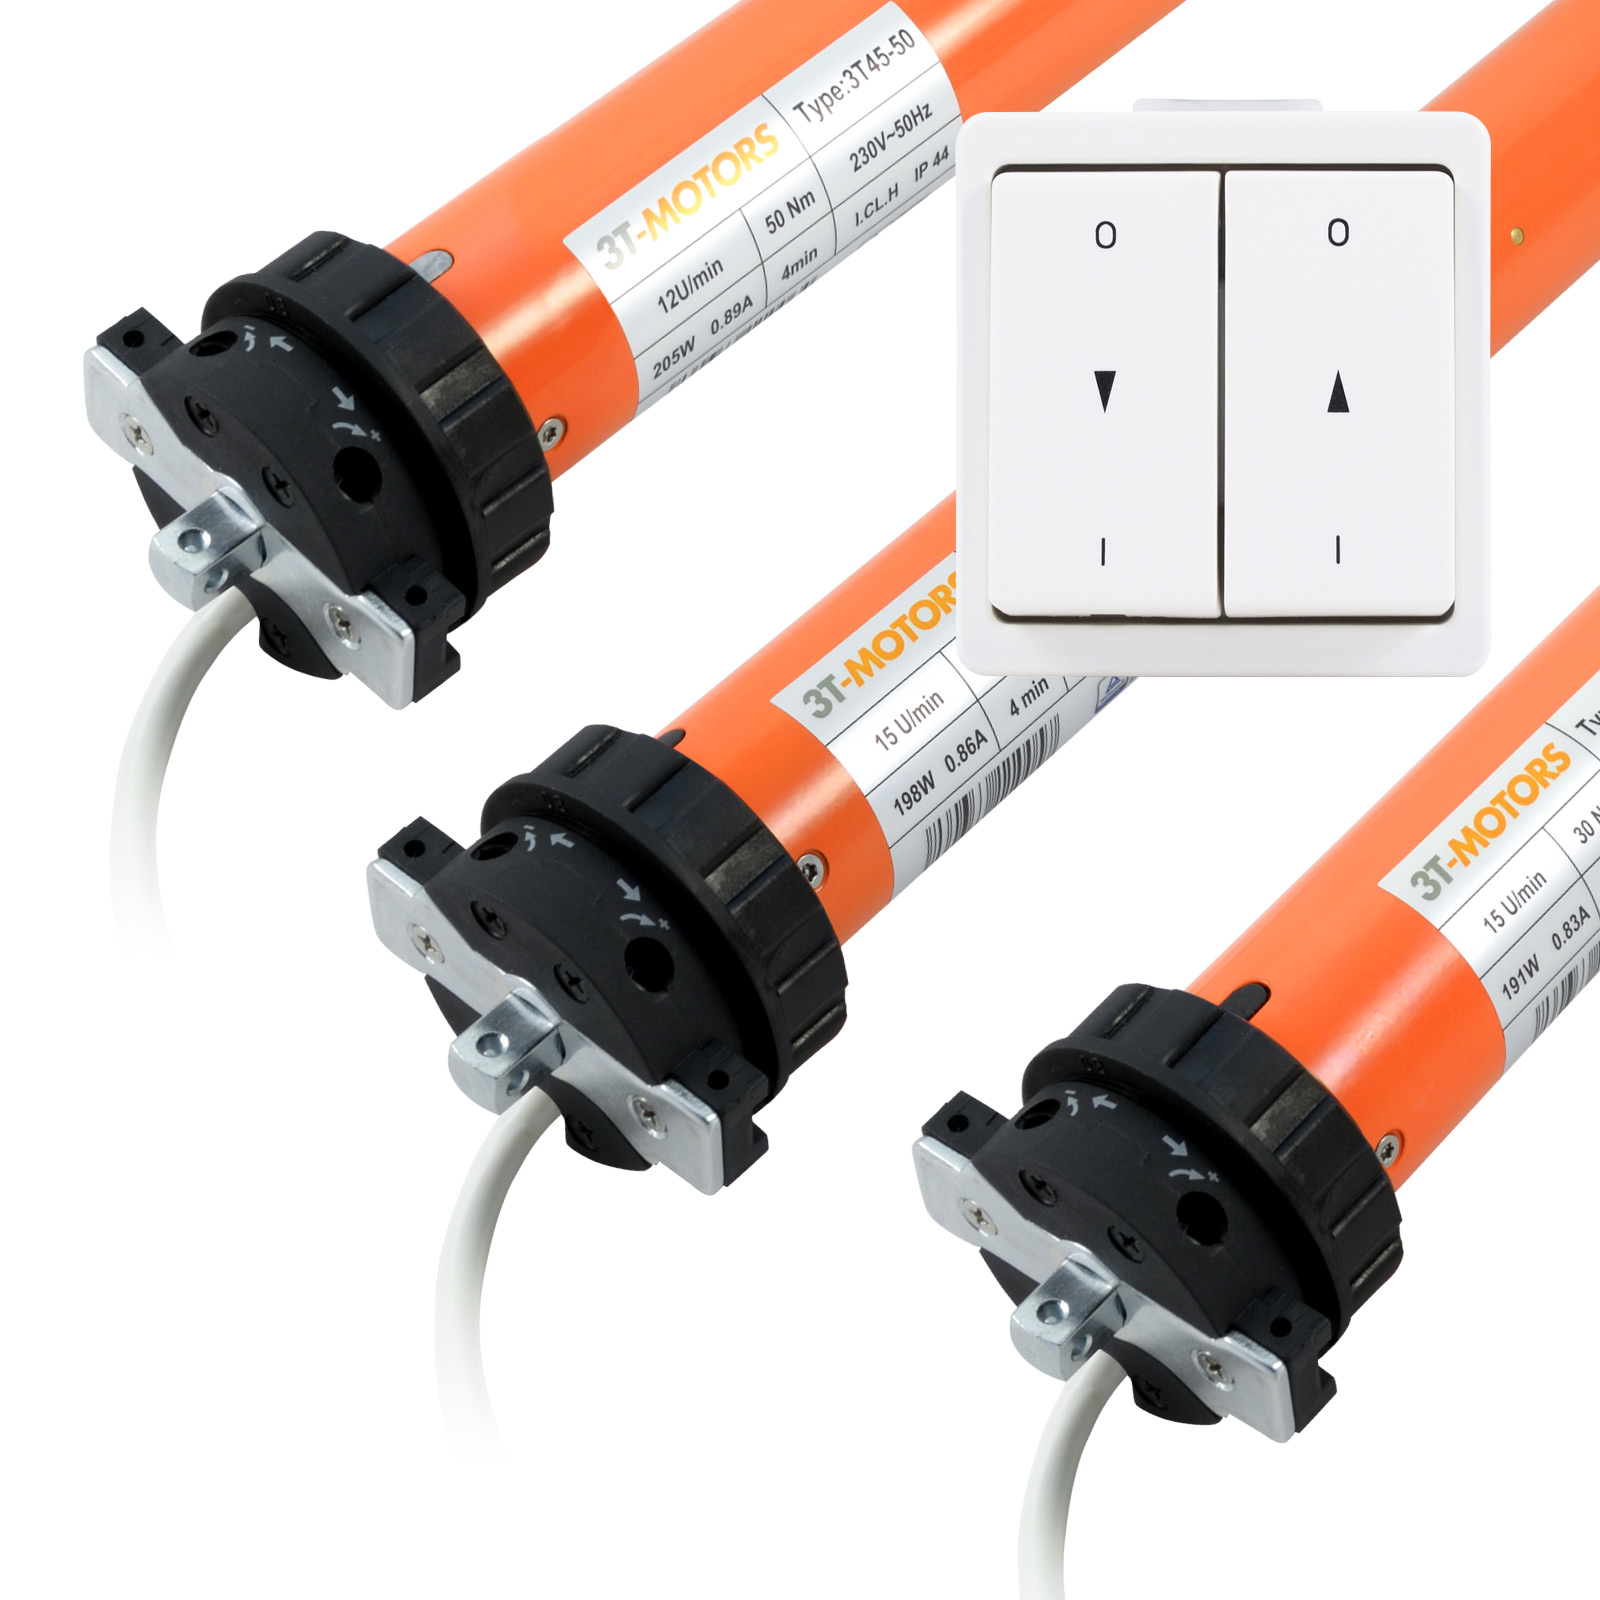 3t motors markisenmotor ap schalter adapter elektrische markise sonnenschutz ebay. Black Bedroom Furniture Sets. Home Design Ideas